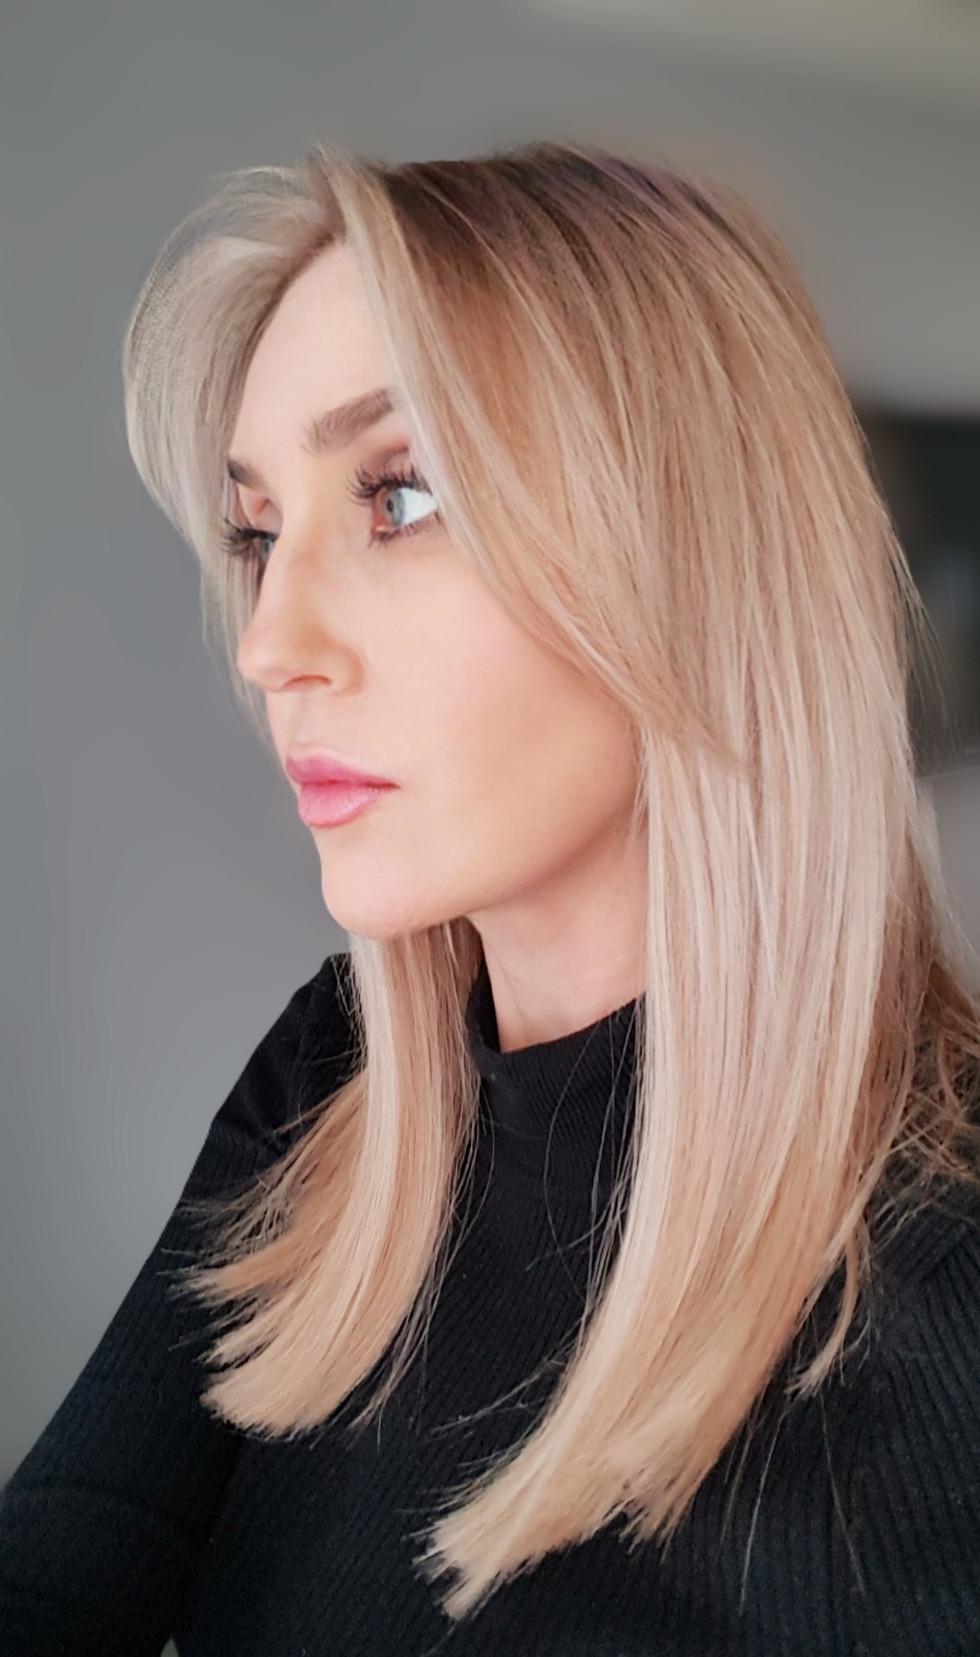 hair model 2020.jpg